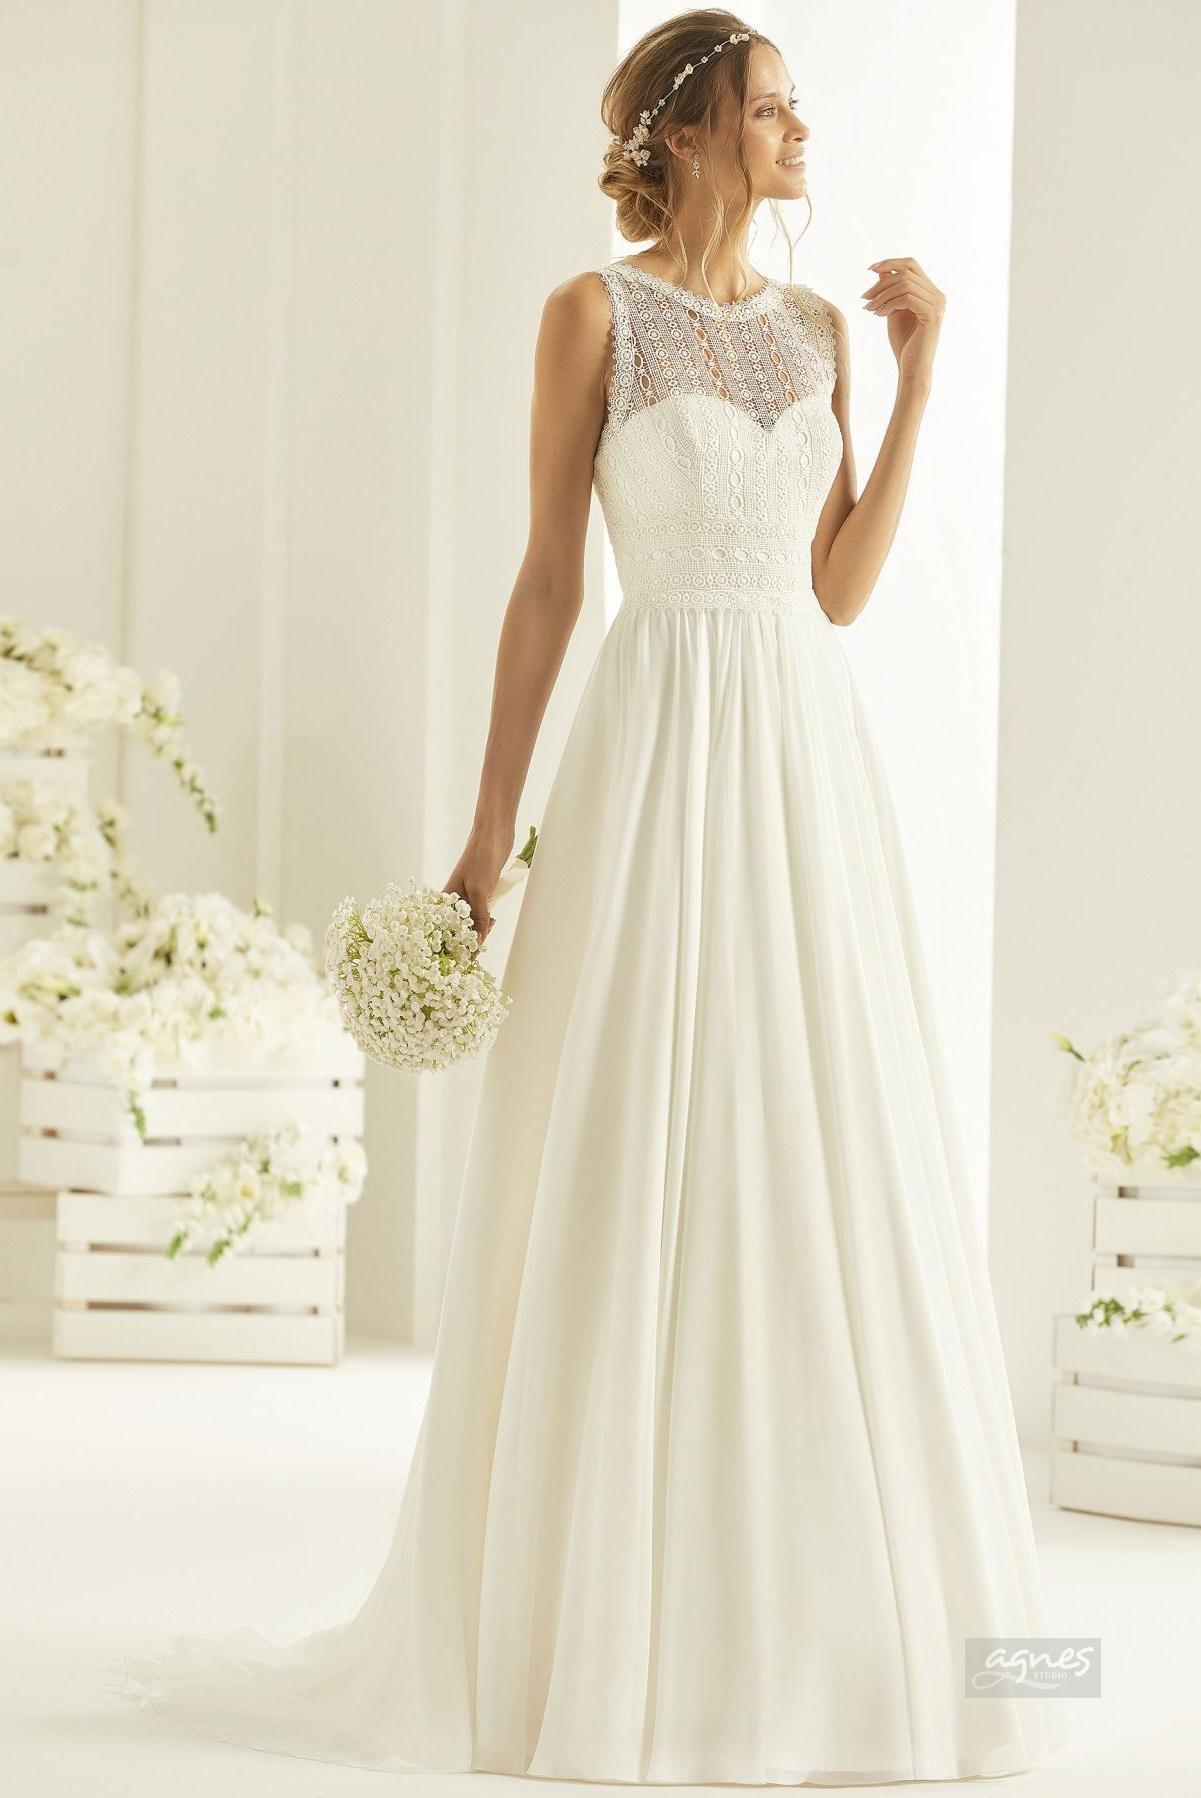 OPHELIA-(1) Bianco-Evento-bridal-dress-studioagnes